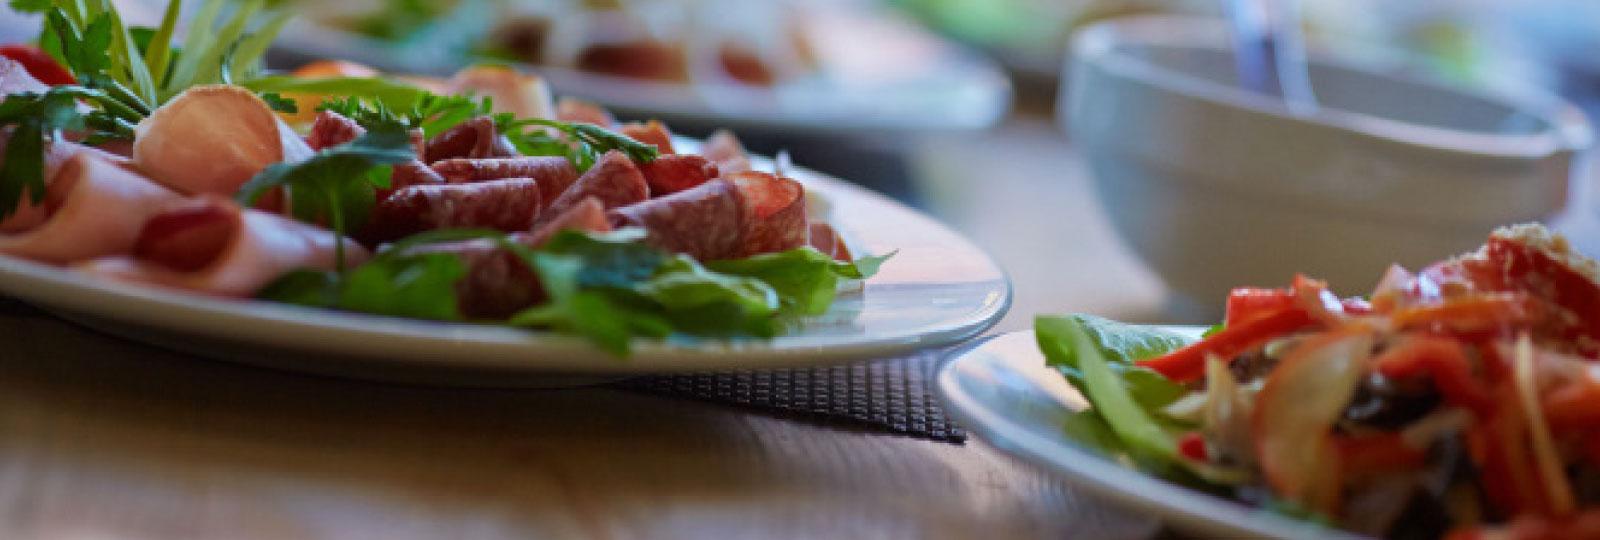 Cutlery on a table